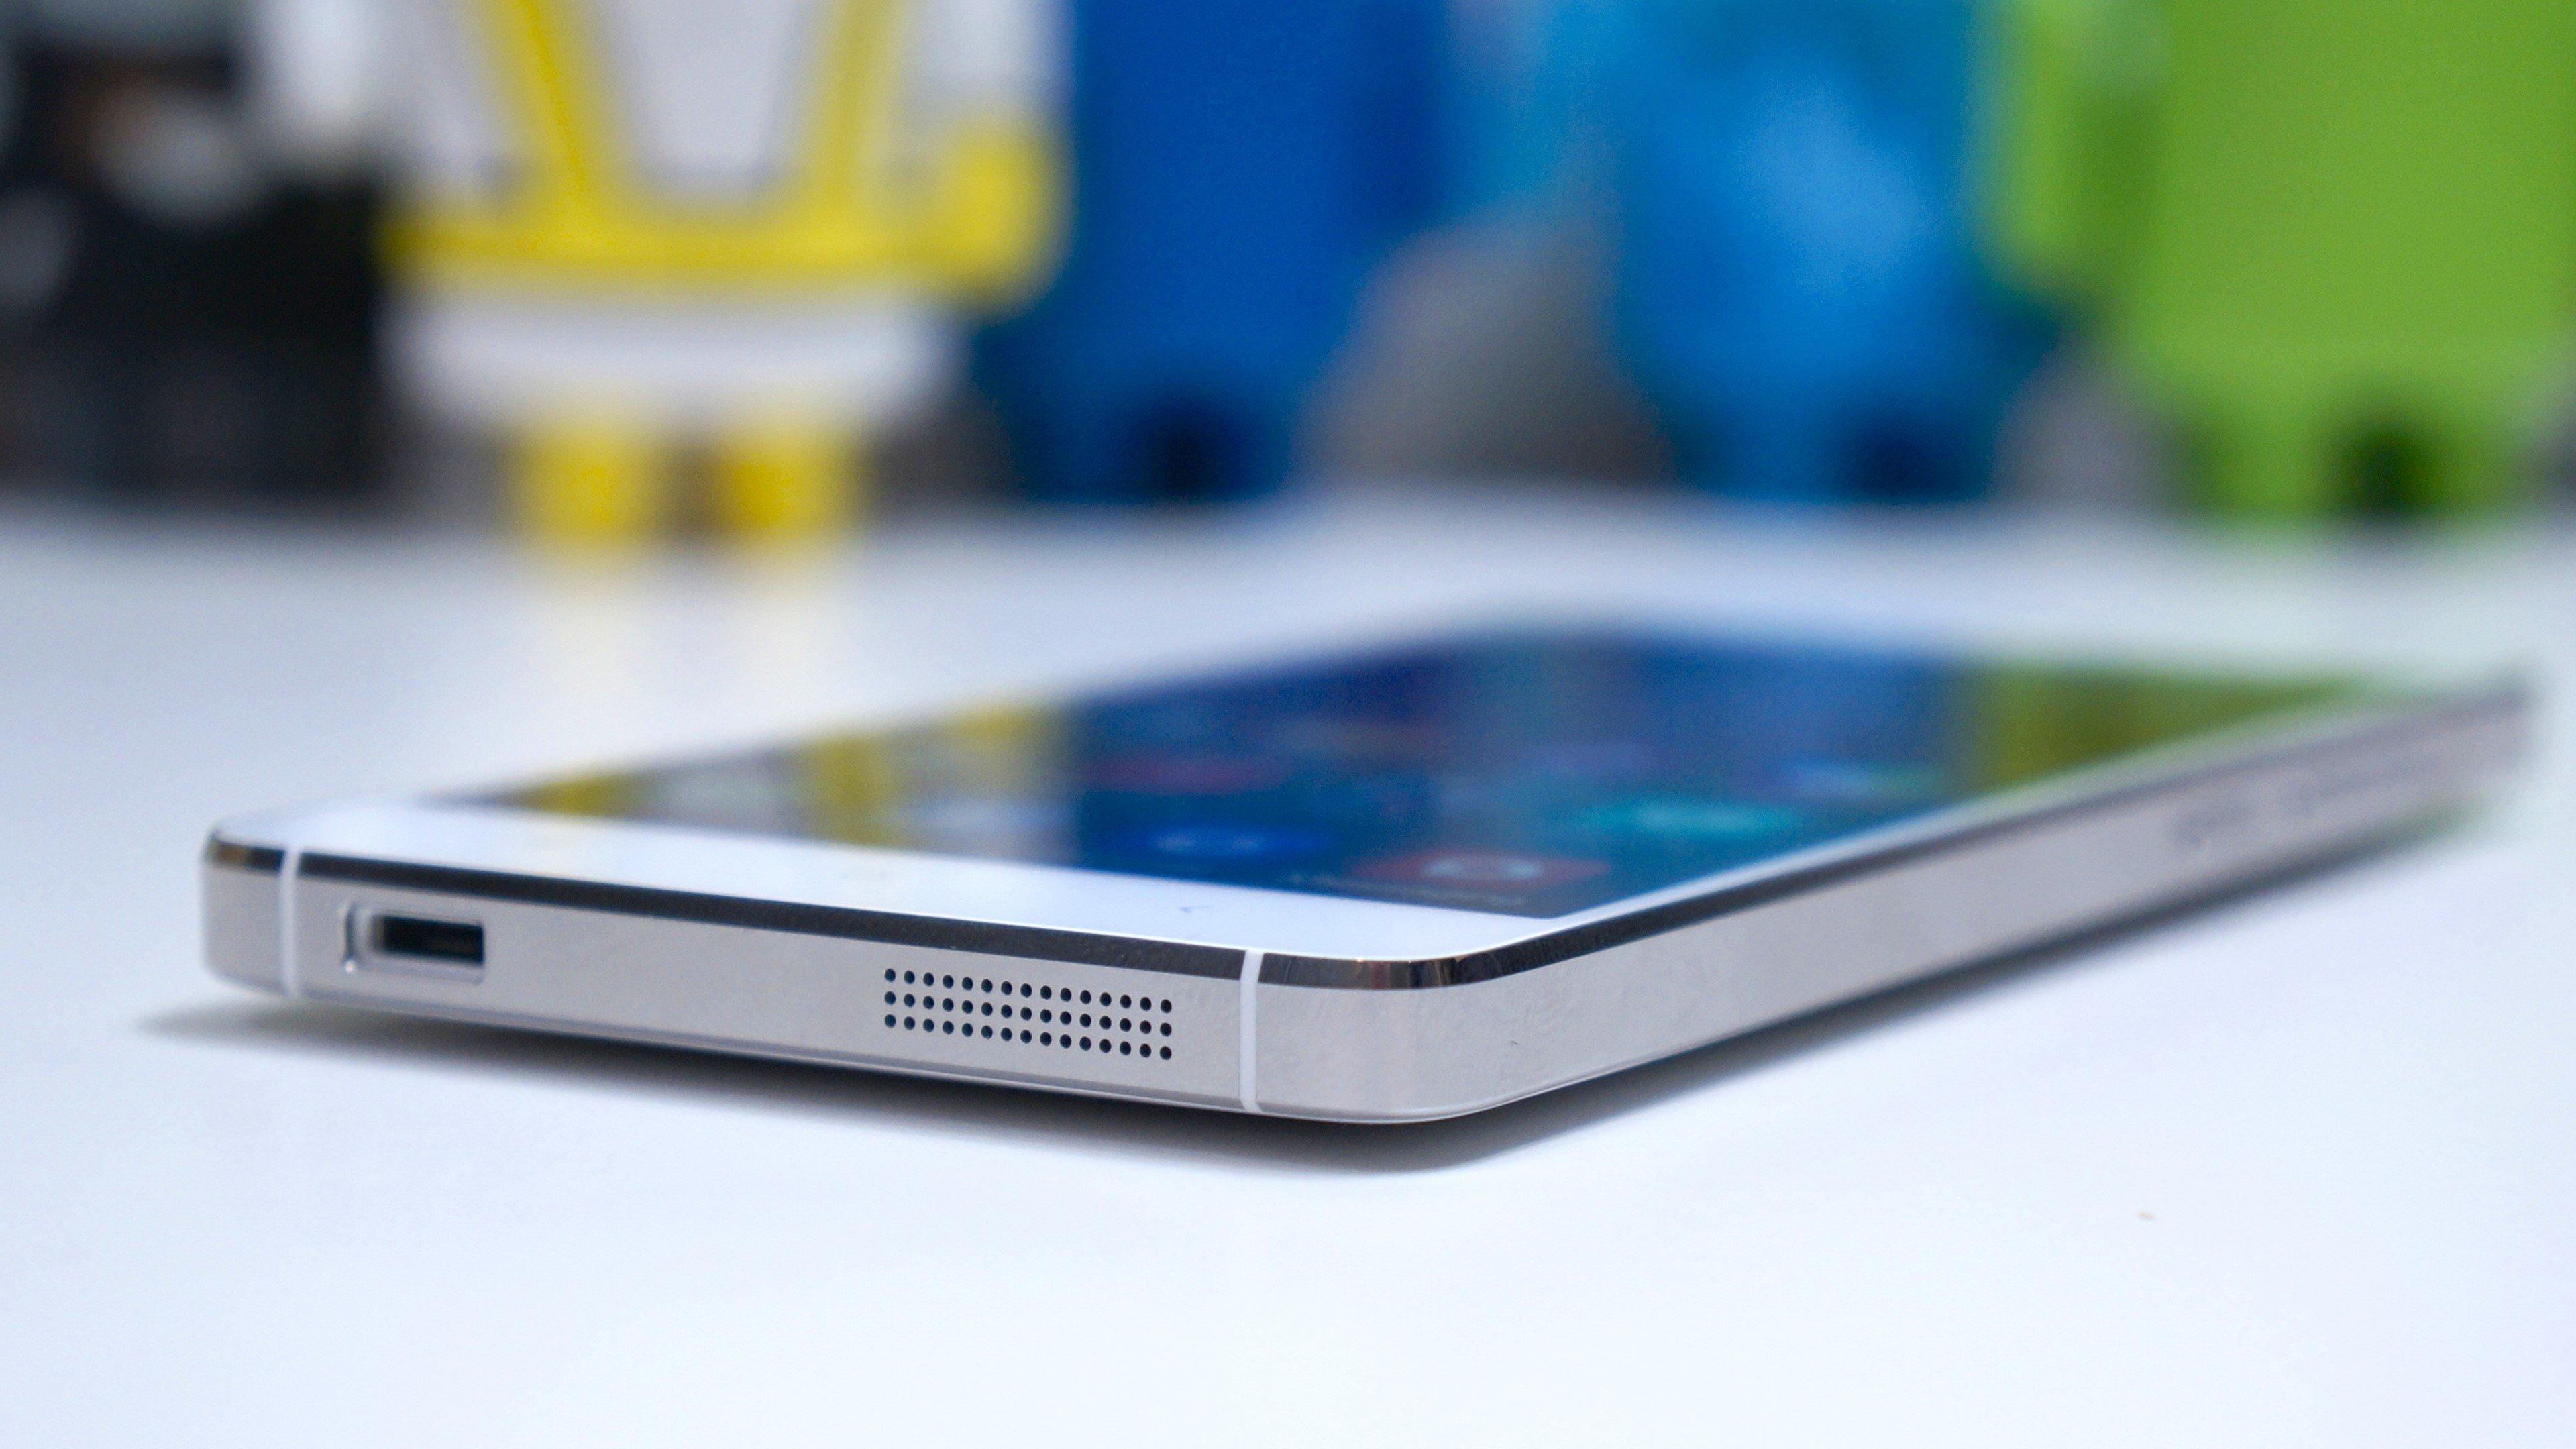 Wallpaper Xiaomi MI4 Smartphone